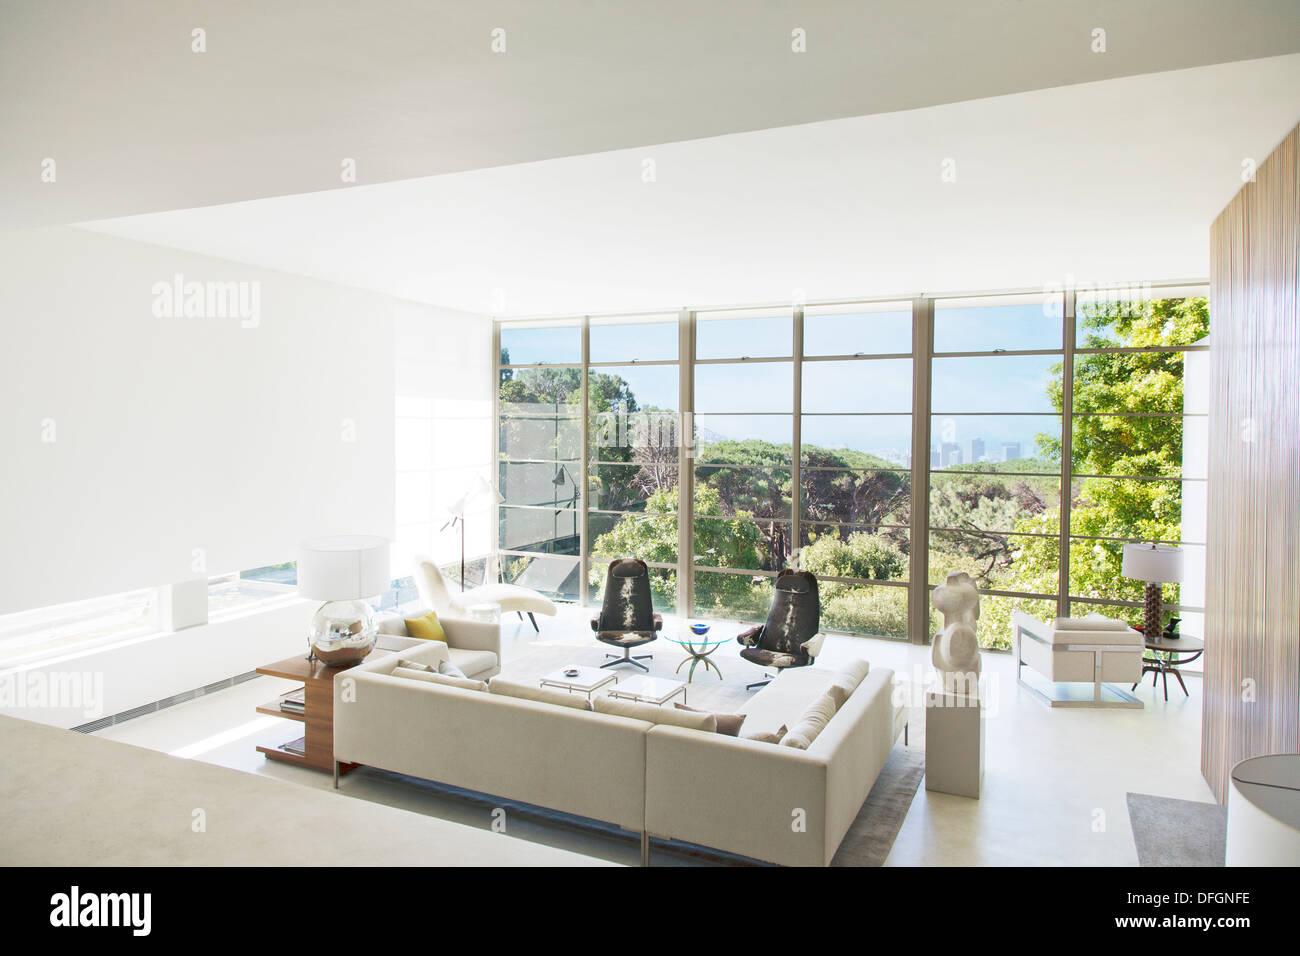 Modern living room overlooking trees Stock Photo: 61219074 - Alamy